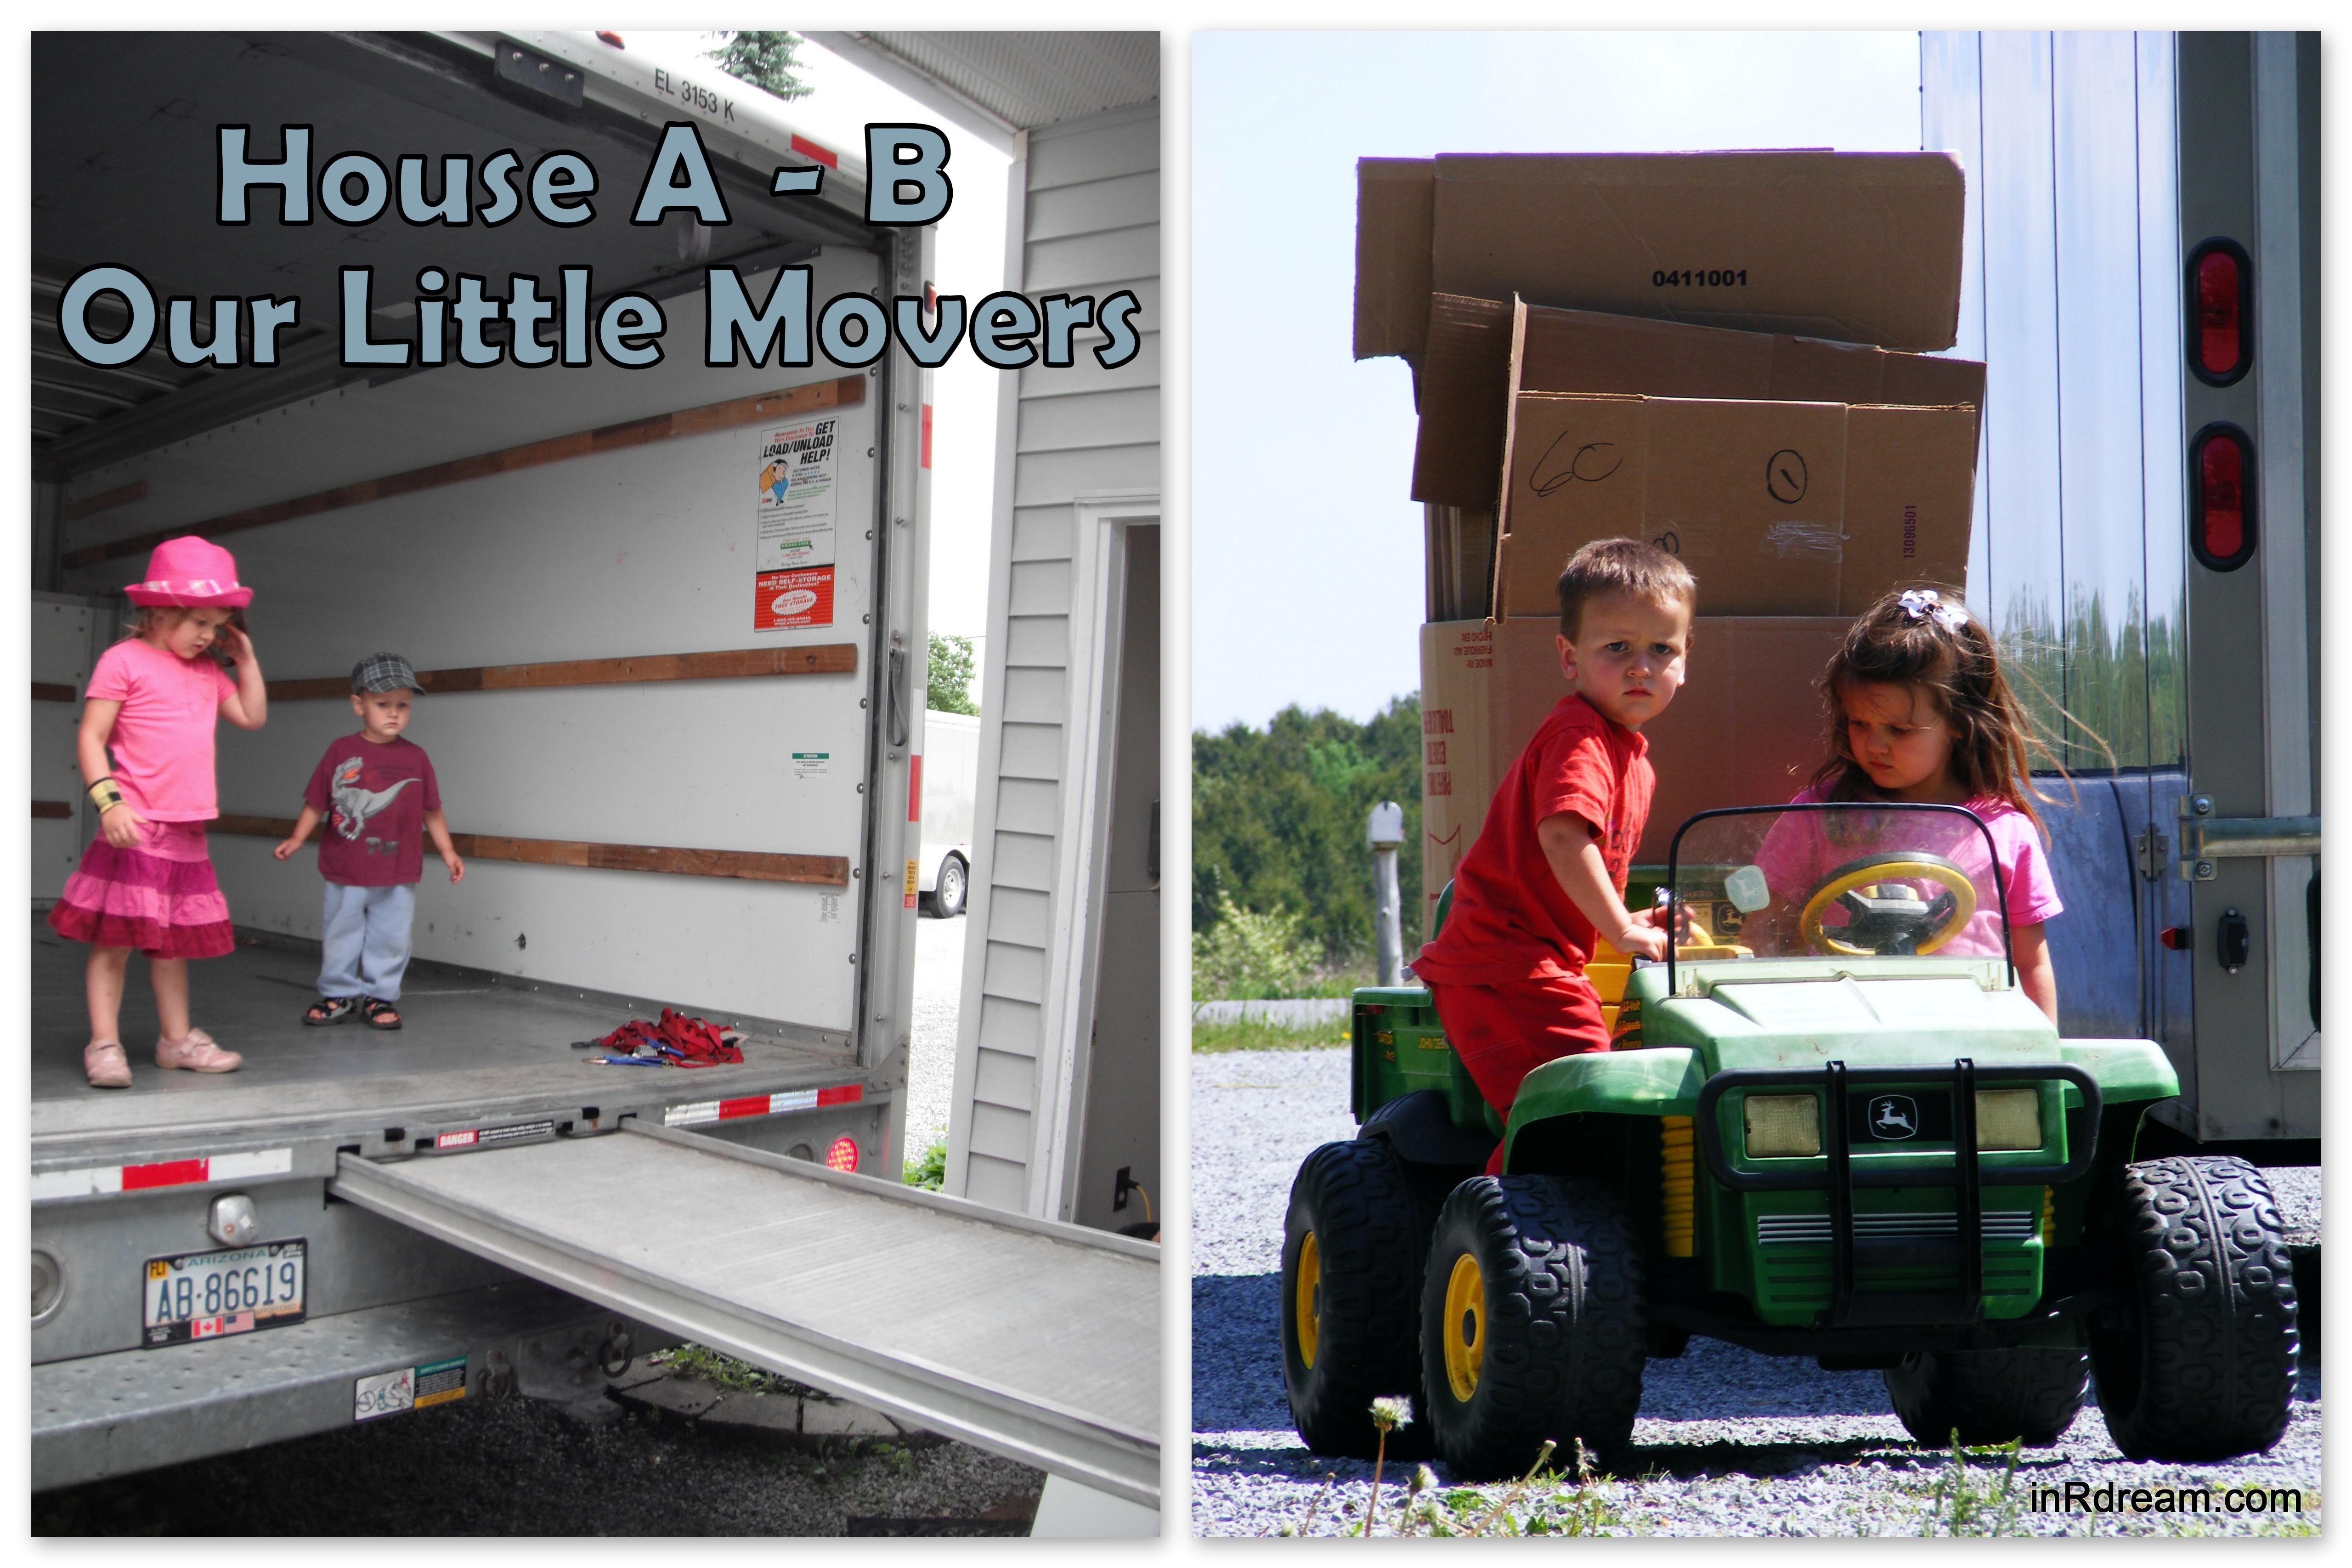 Moving + Renovation Tips plus CAA #caarewards & $500 GC Giveaway